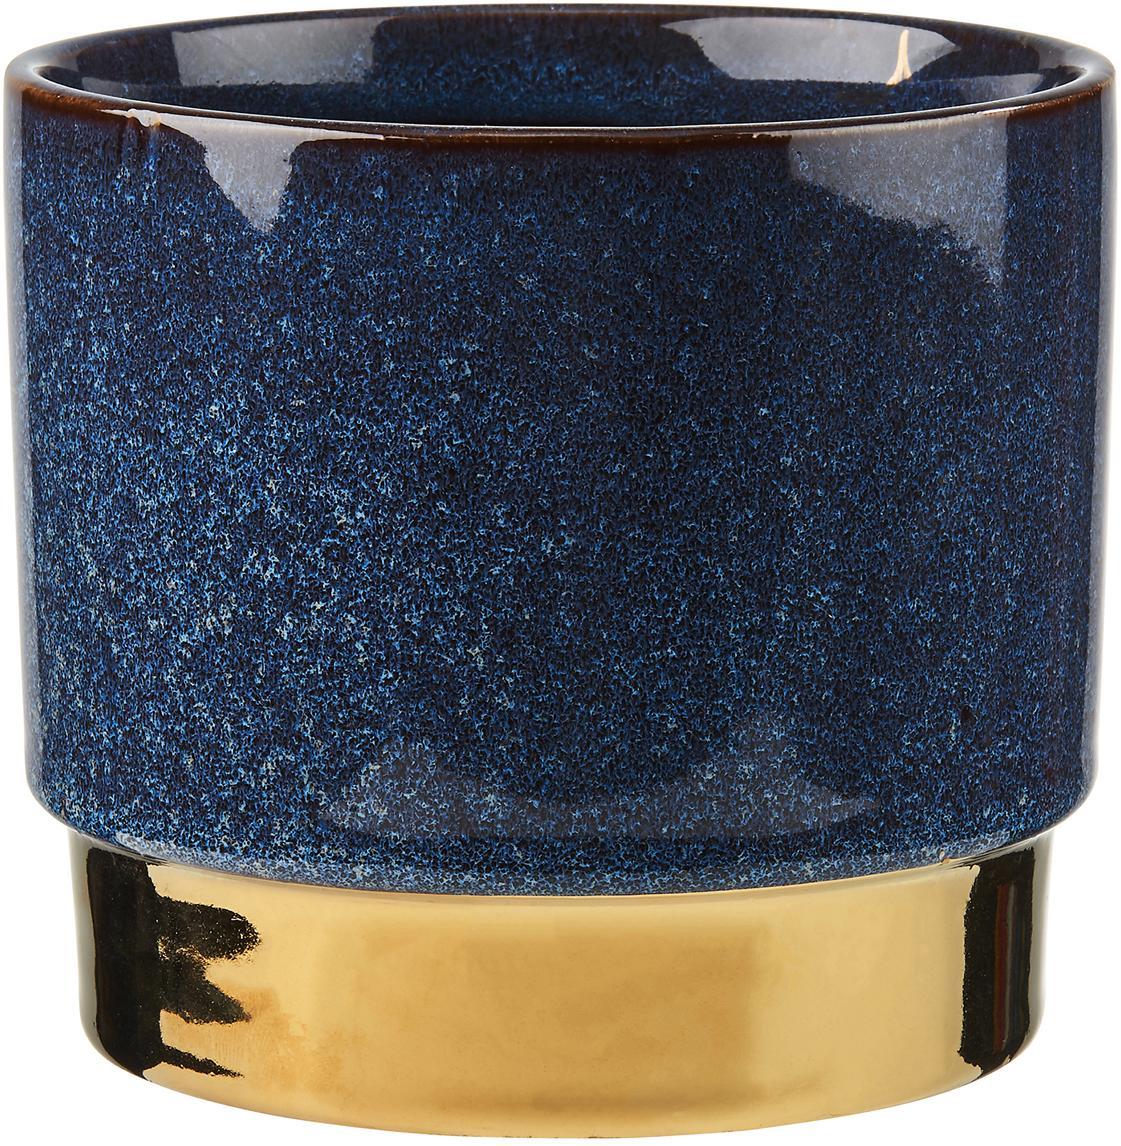 Portavaso in terracotta Golden Touch, Gres, Blu, dorato, Ø 15 x Alt. 13 cm